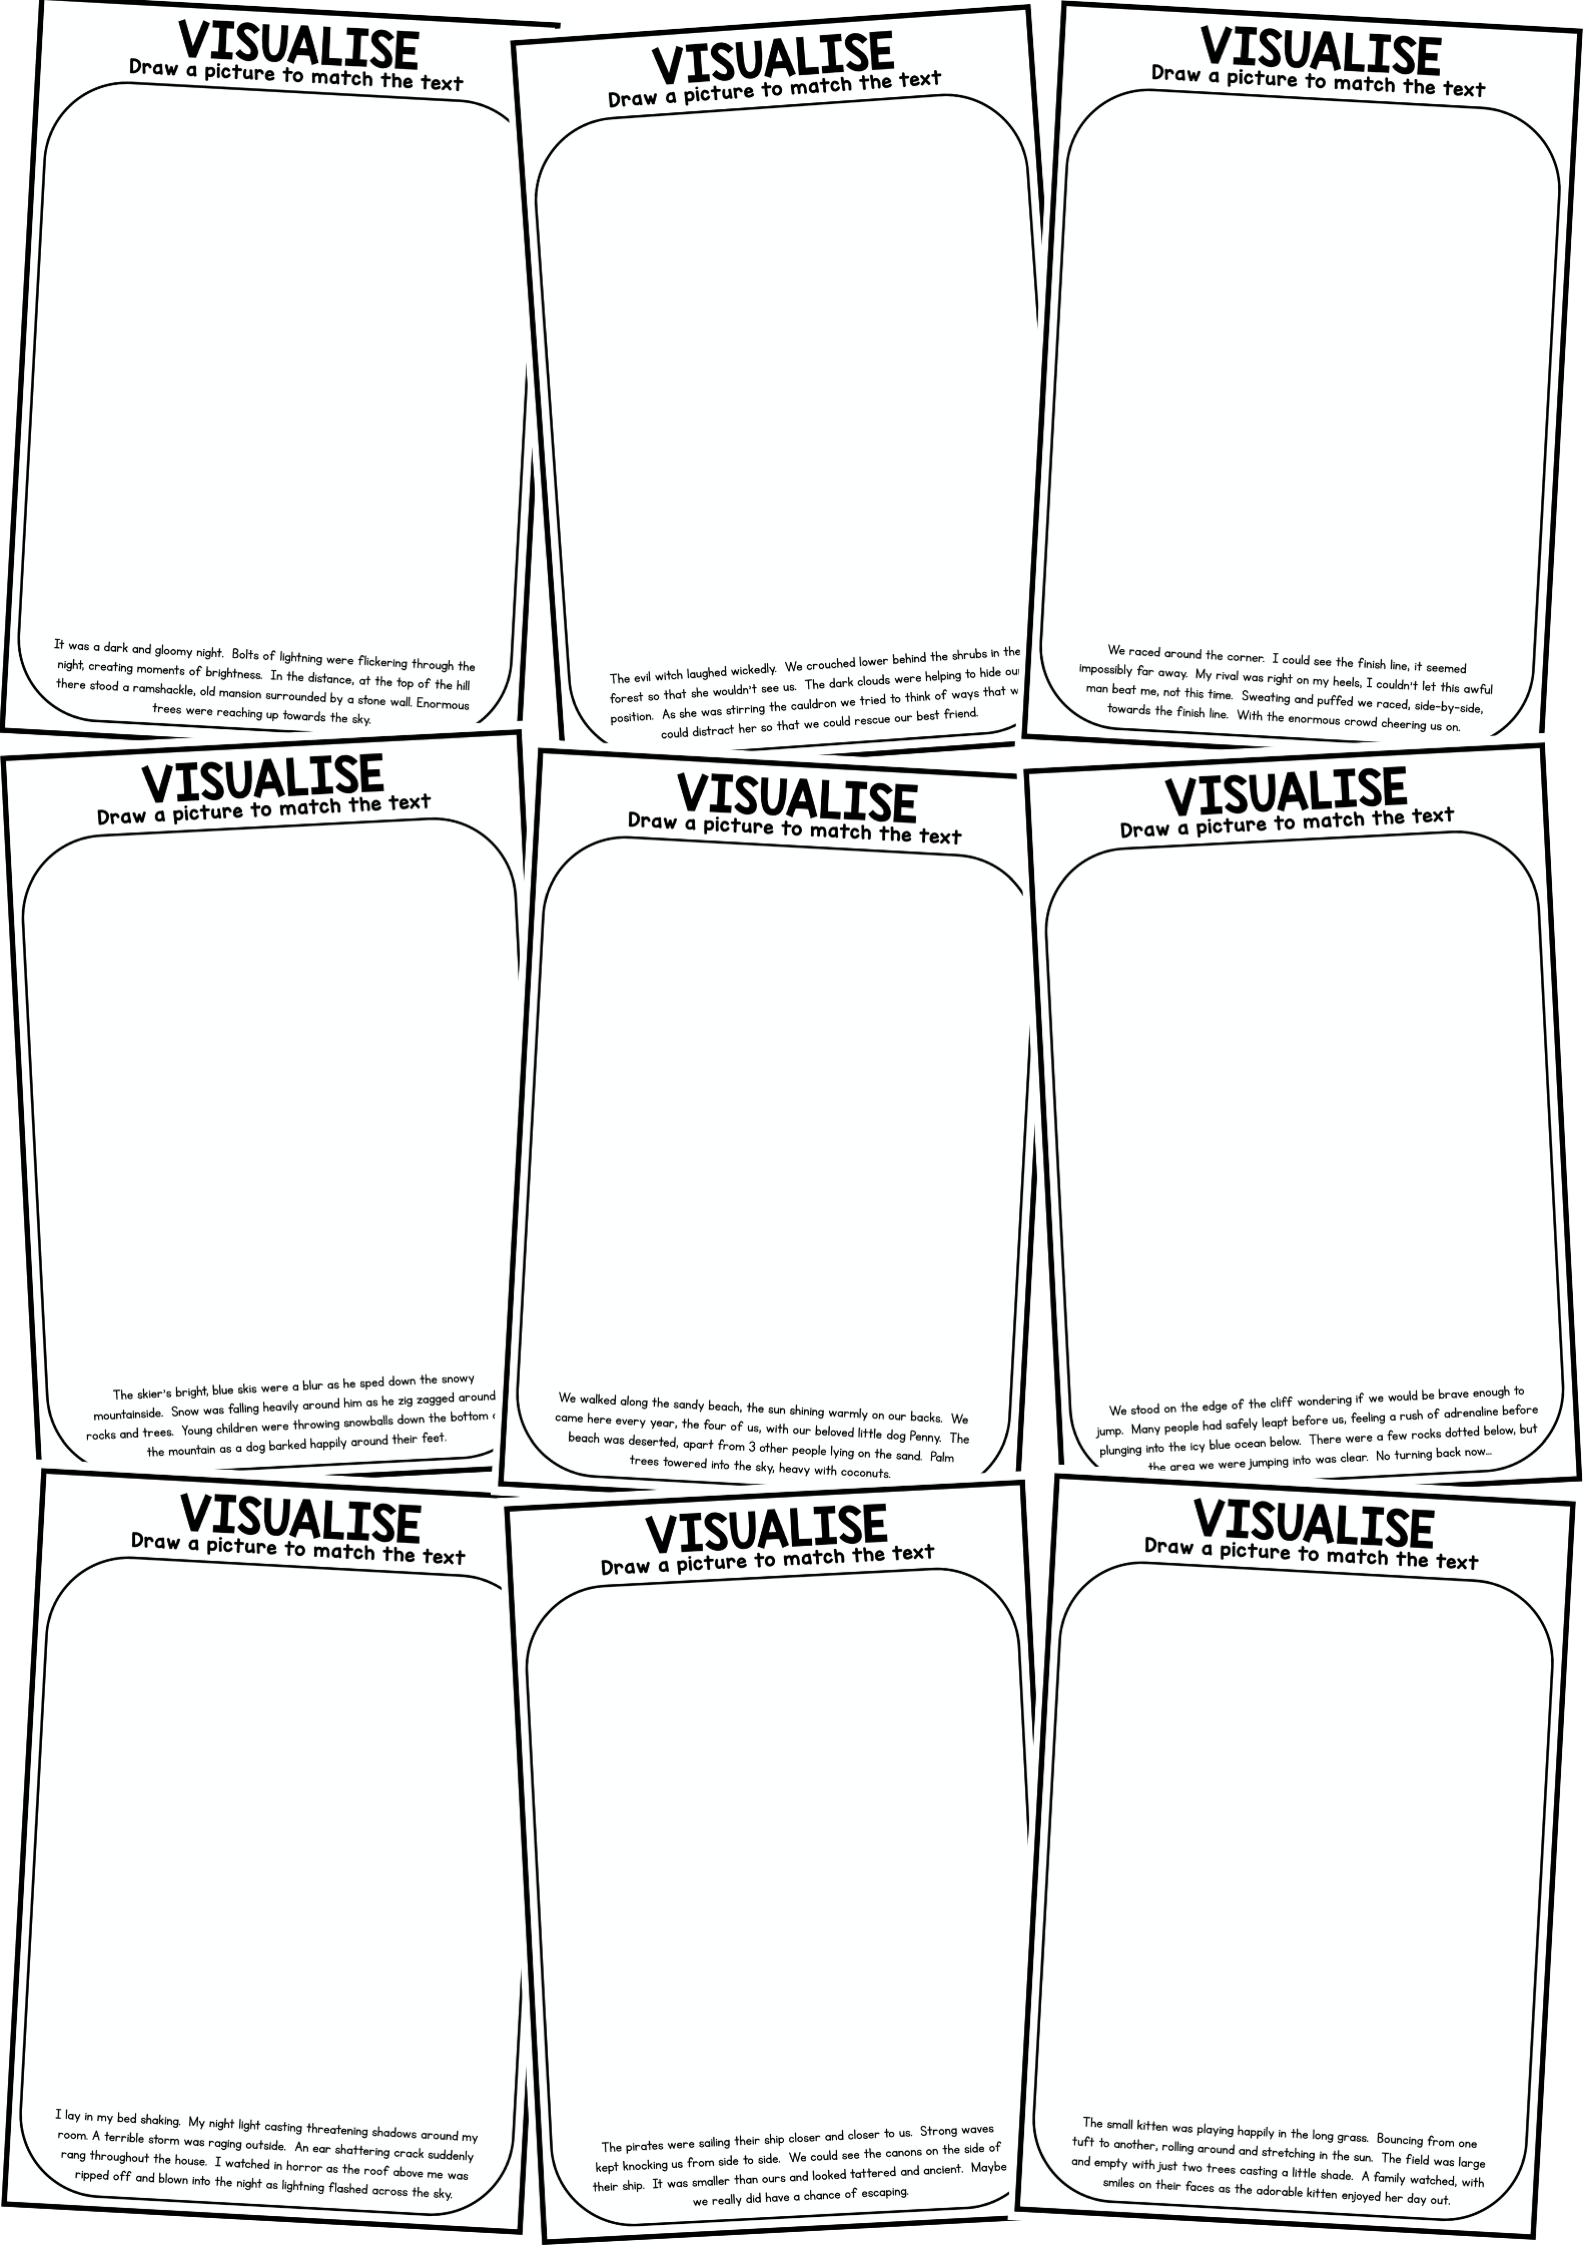 Visualizing Visualising Reading Worksheet Pack Reading Worksheets Reading Strategies Reading Pictures [ 2249 x 1589 Pixel ]